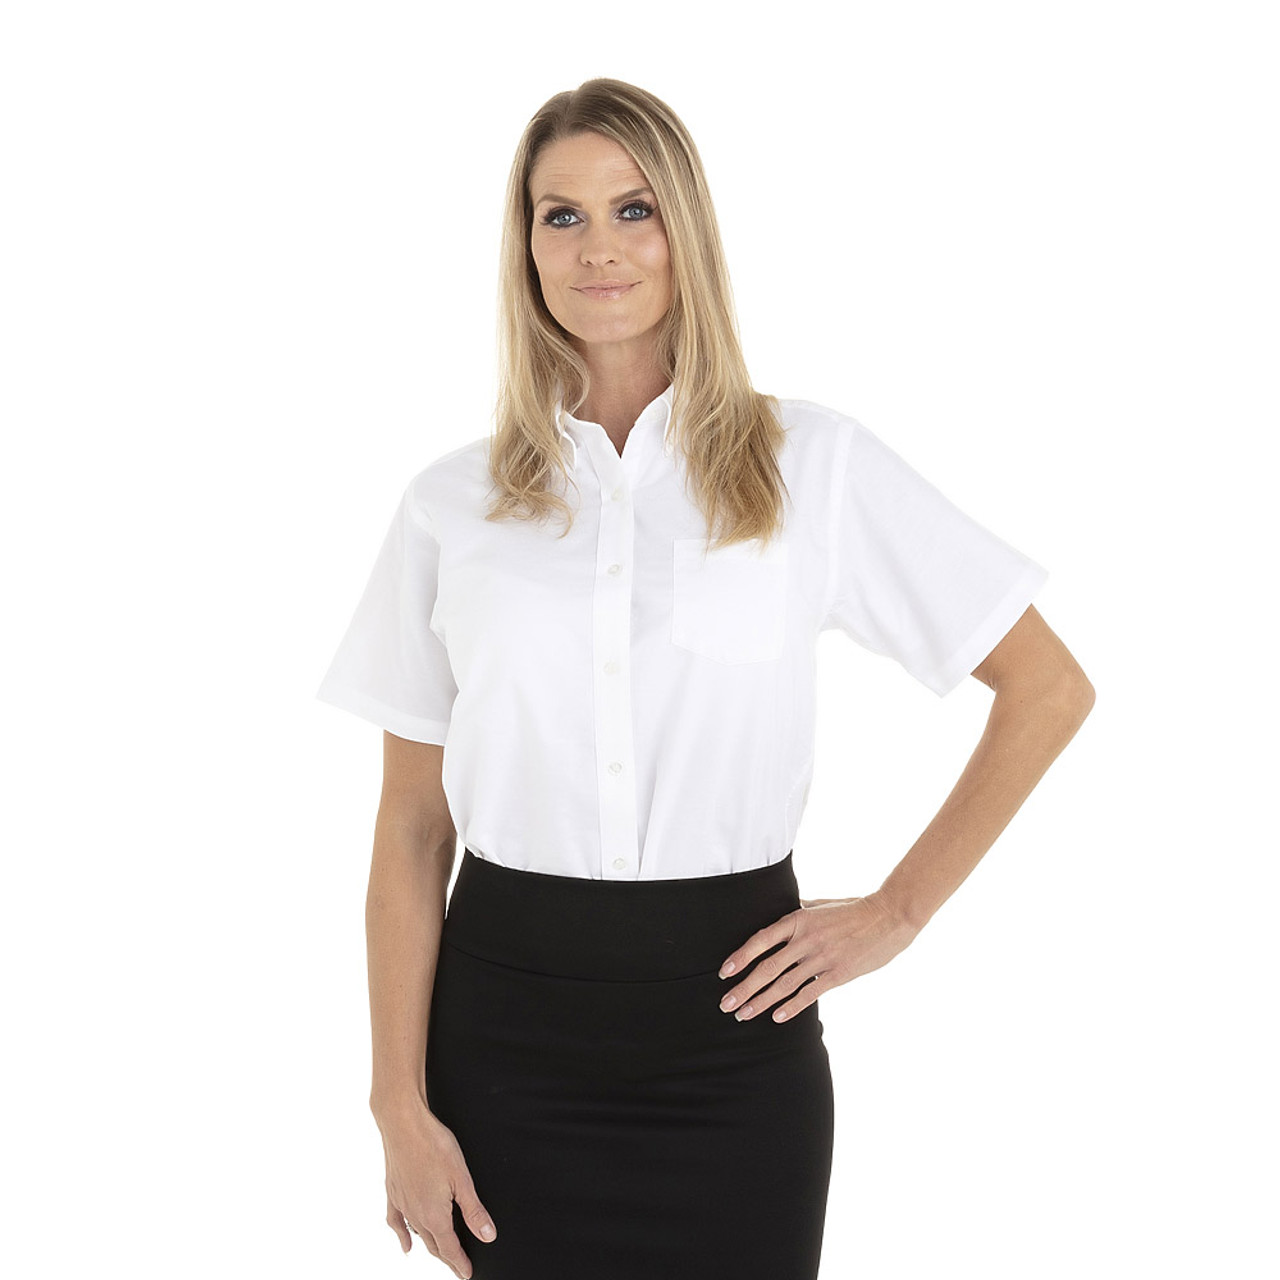 White - 18CV301 Van Heusen Ladies' Short Sleeve Oxford Shirt -T-shirt.ca